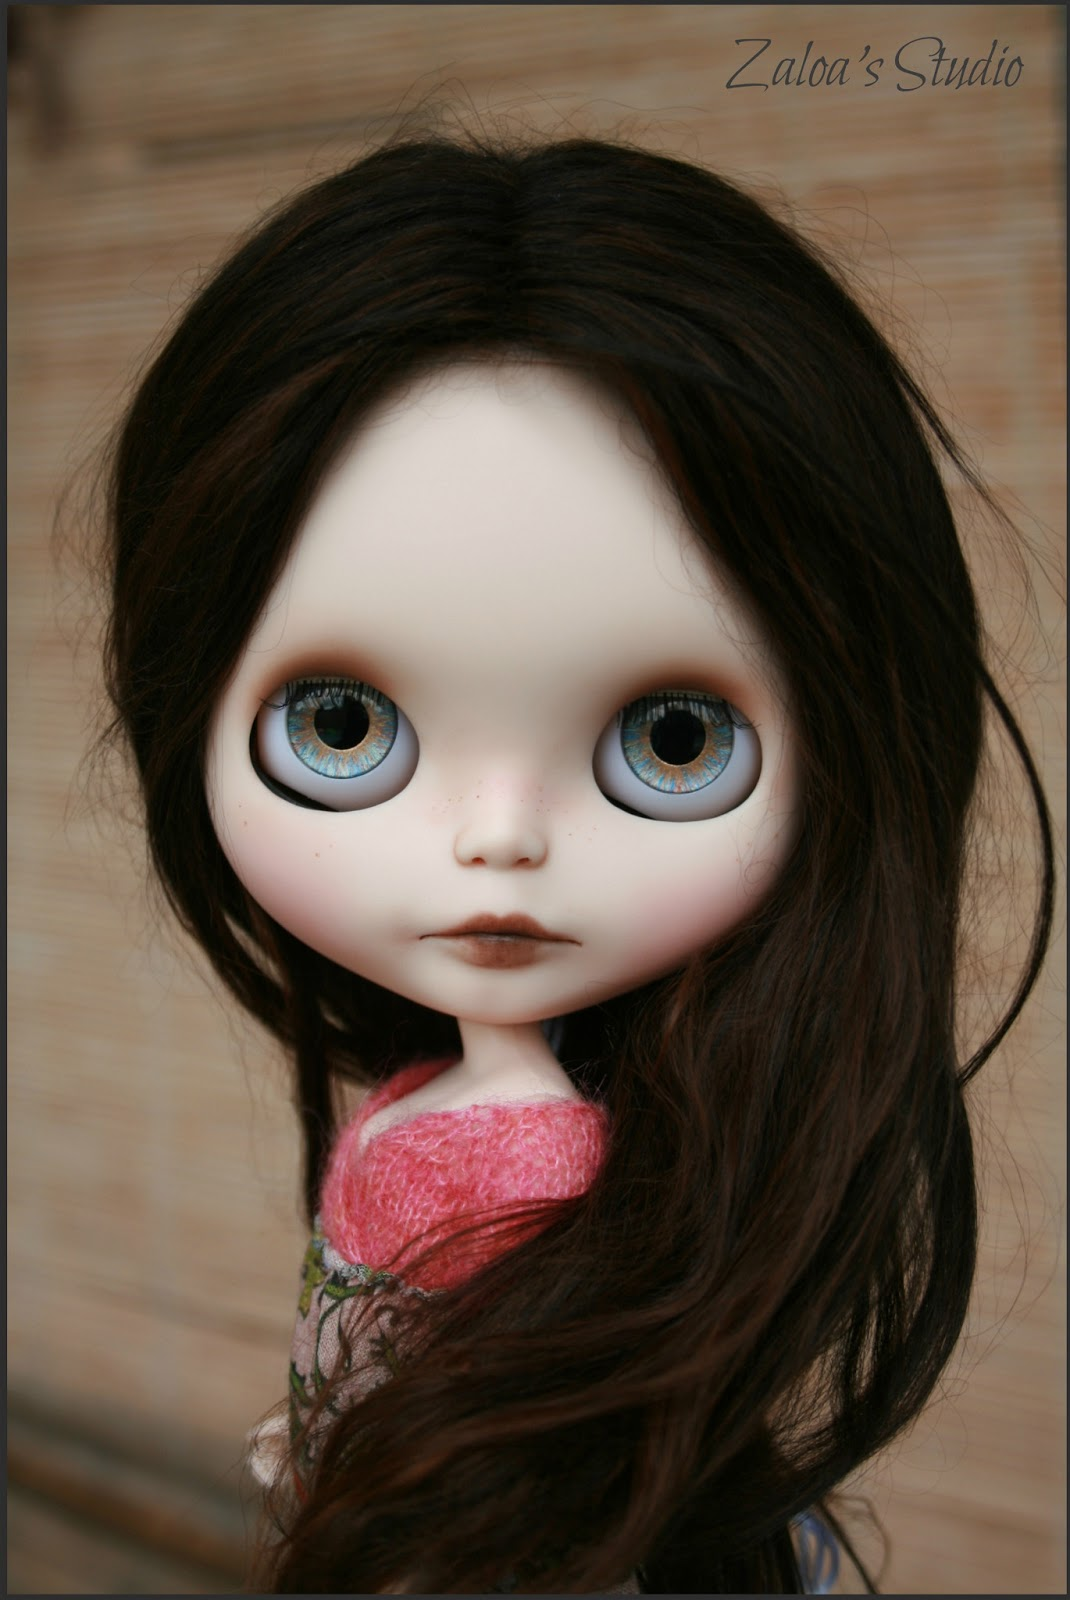 Zaloa's Studio: Zaloa Custom Blythe Doll- Taking Offers